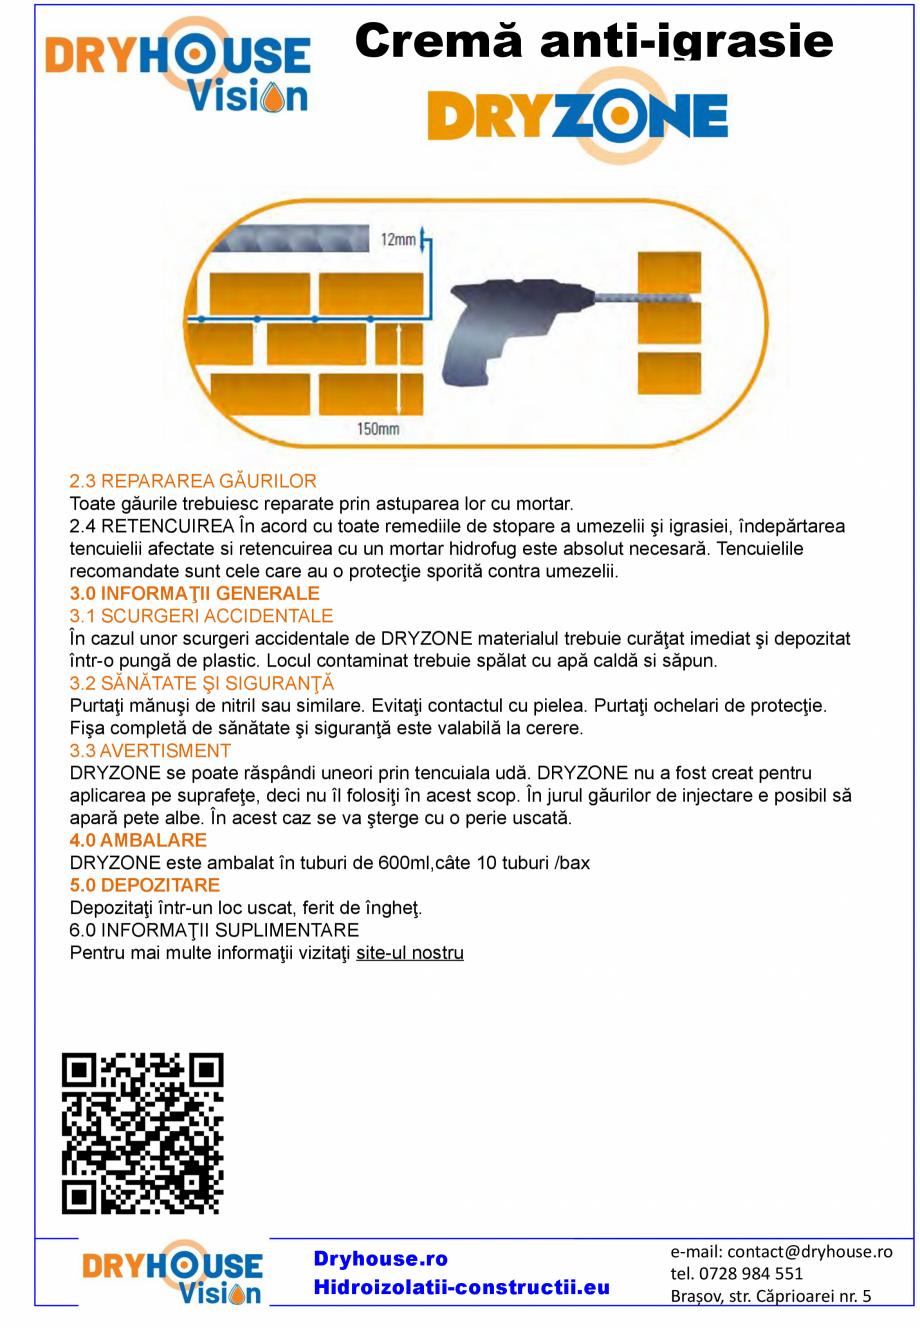 Pagina 4 - Crema anti-igrasie DRYHOUSE VISION DRYZONE Fisa tehnica Romana hidrocarburi. GARANŢIA...